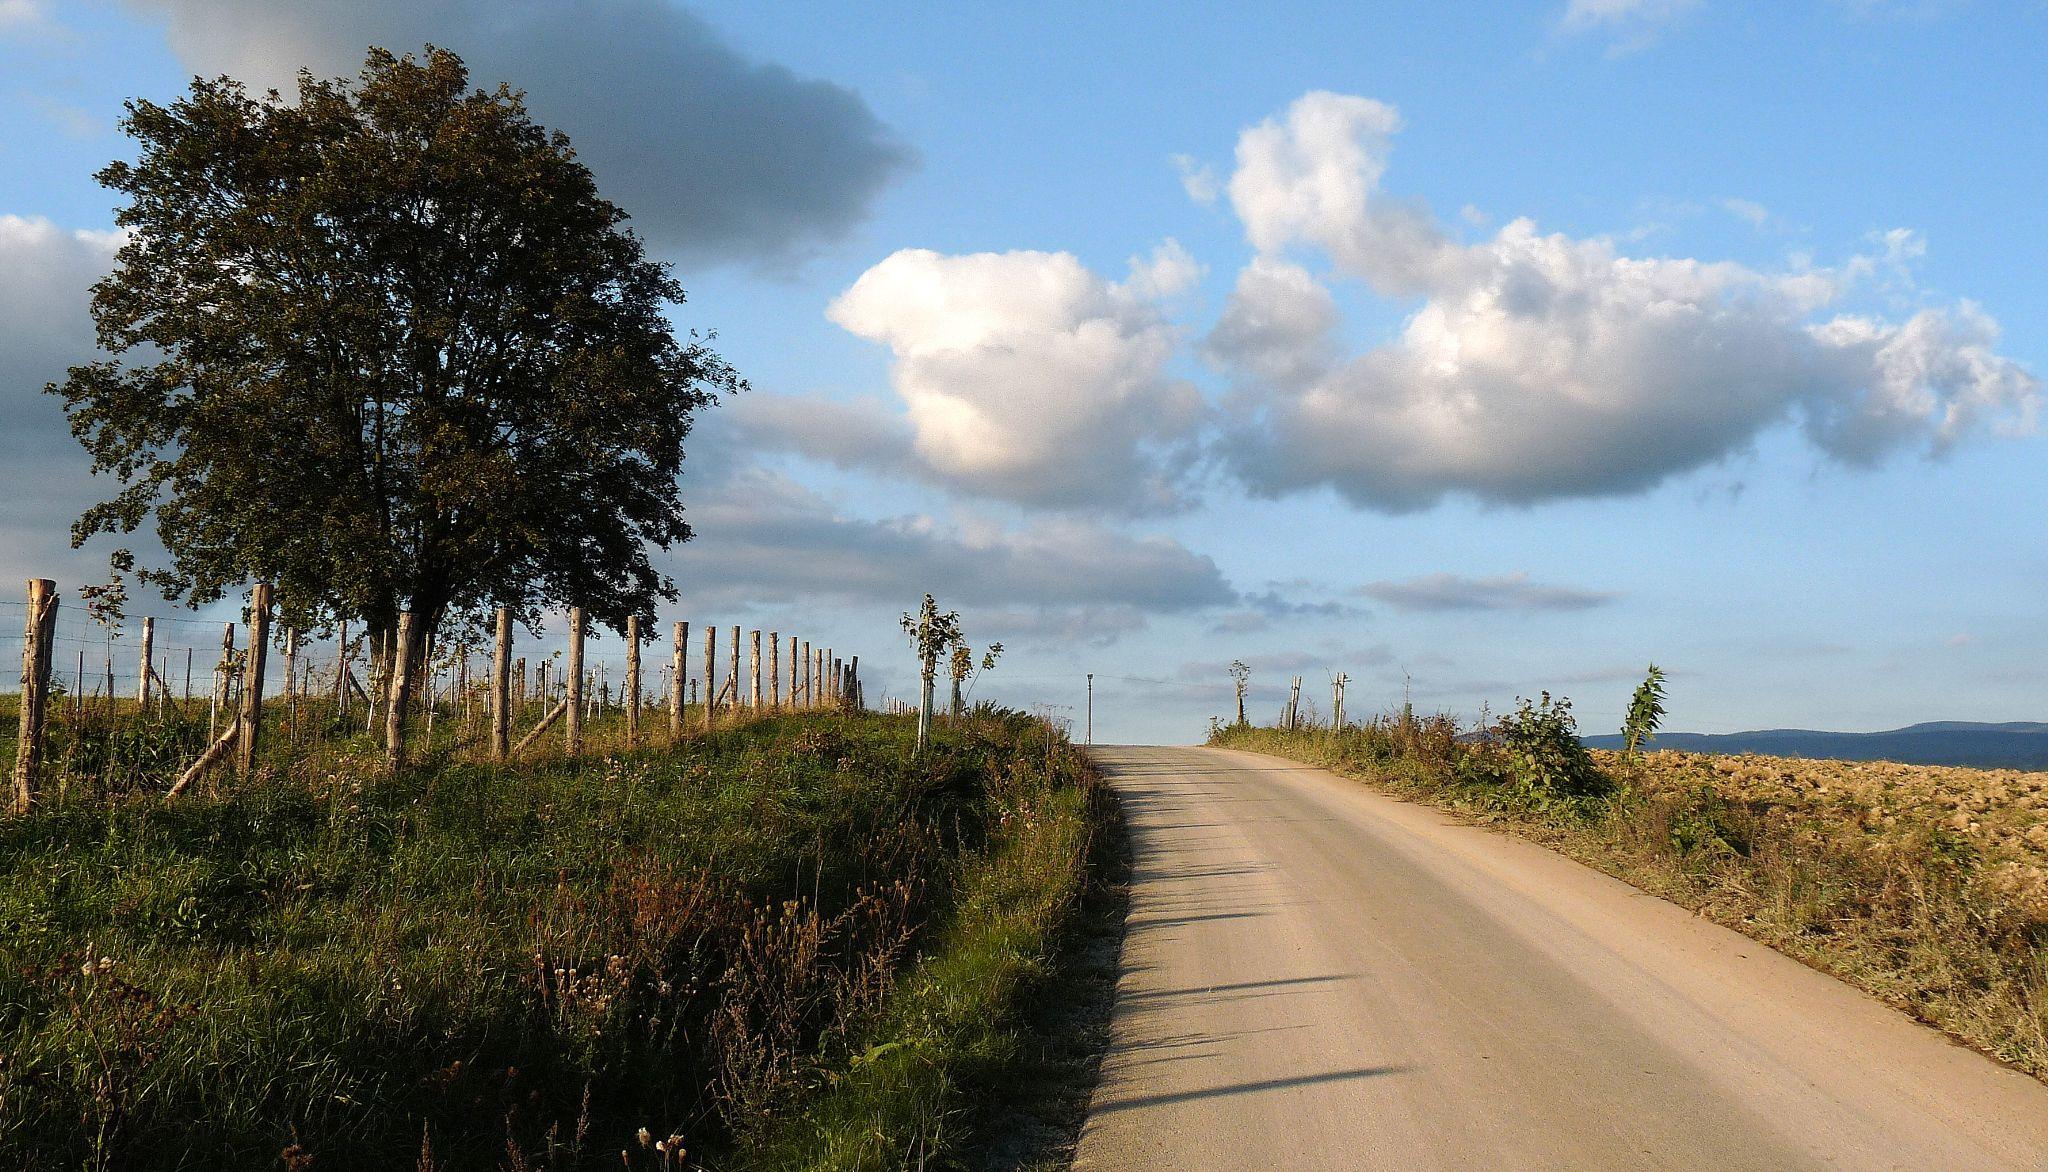 Cesta do nebe by Hana